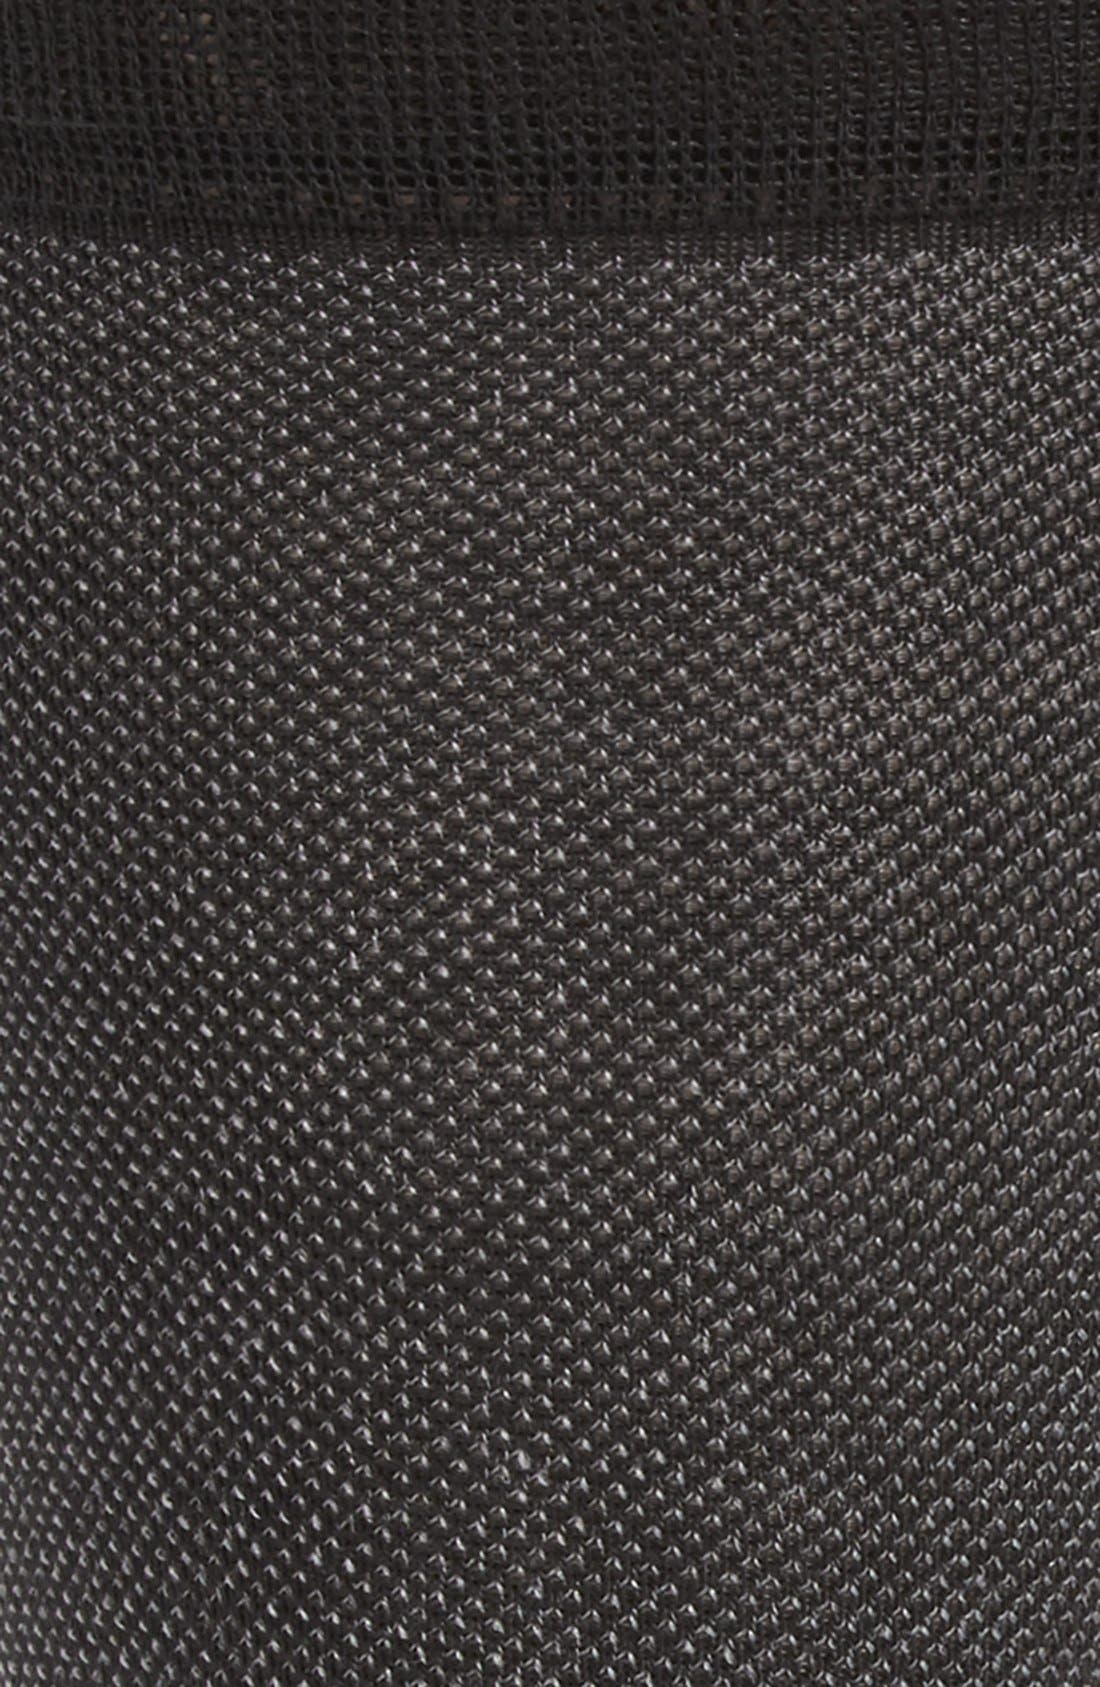 Piqué Texture Crew Socks,                             Alternate thumbnail 4, color,                             BLACK